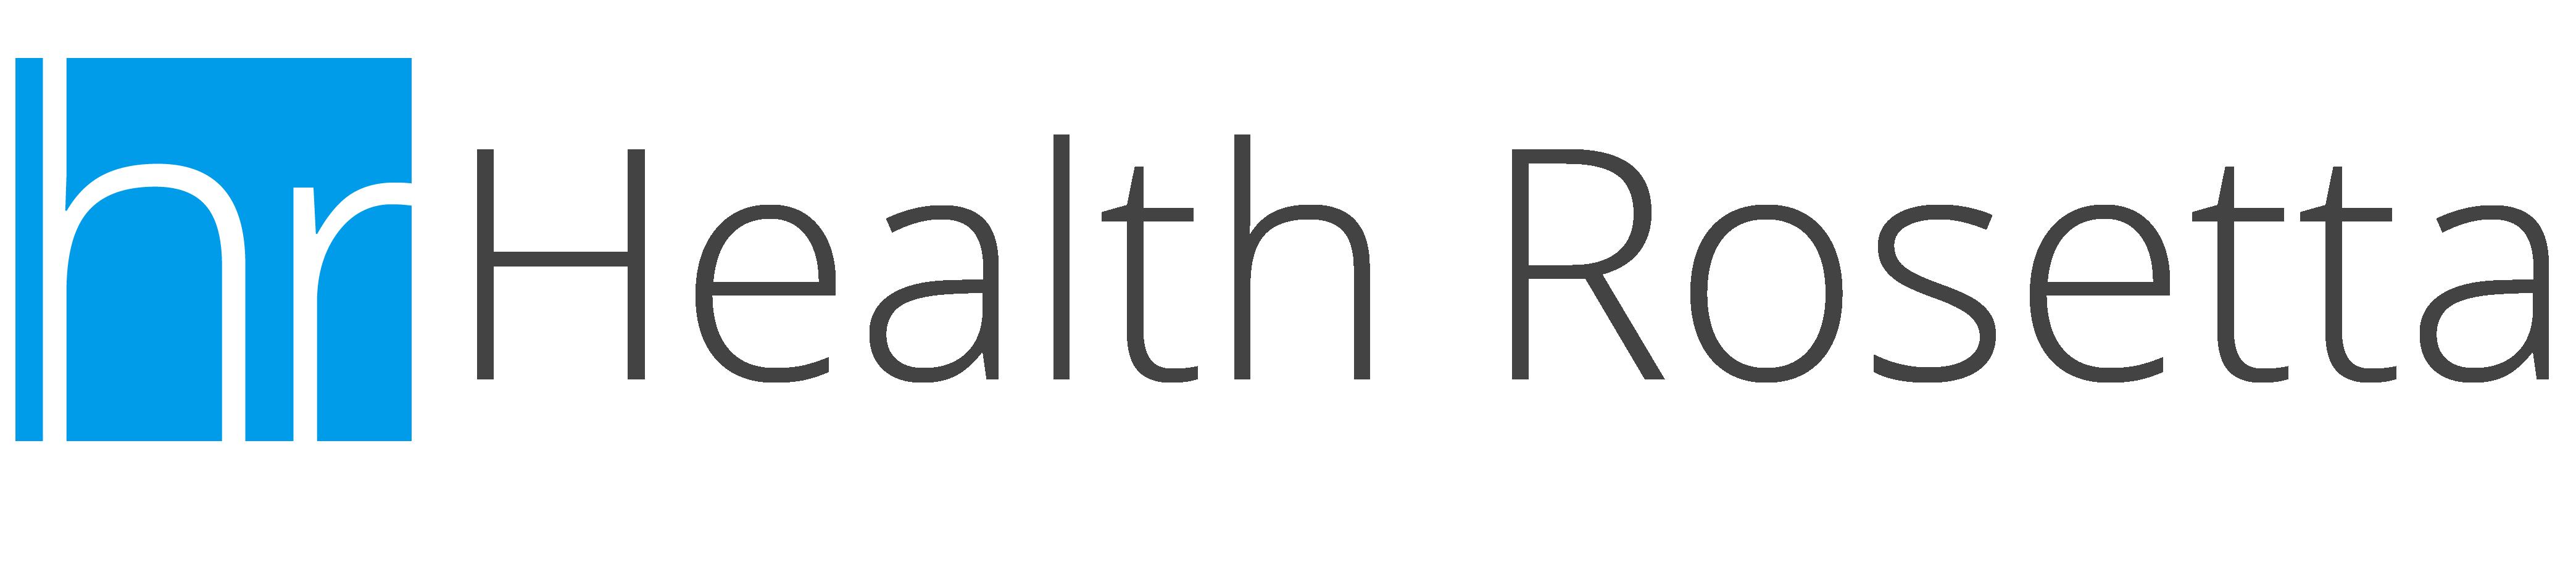 Health Rosetta logo